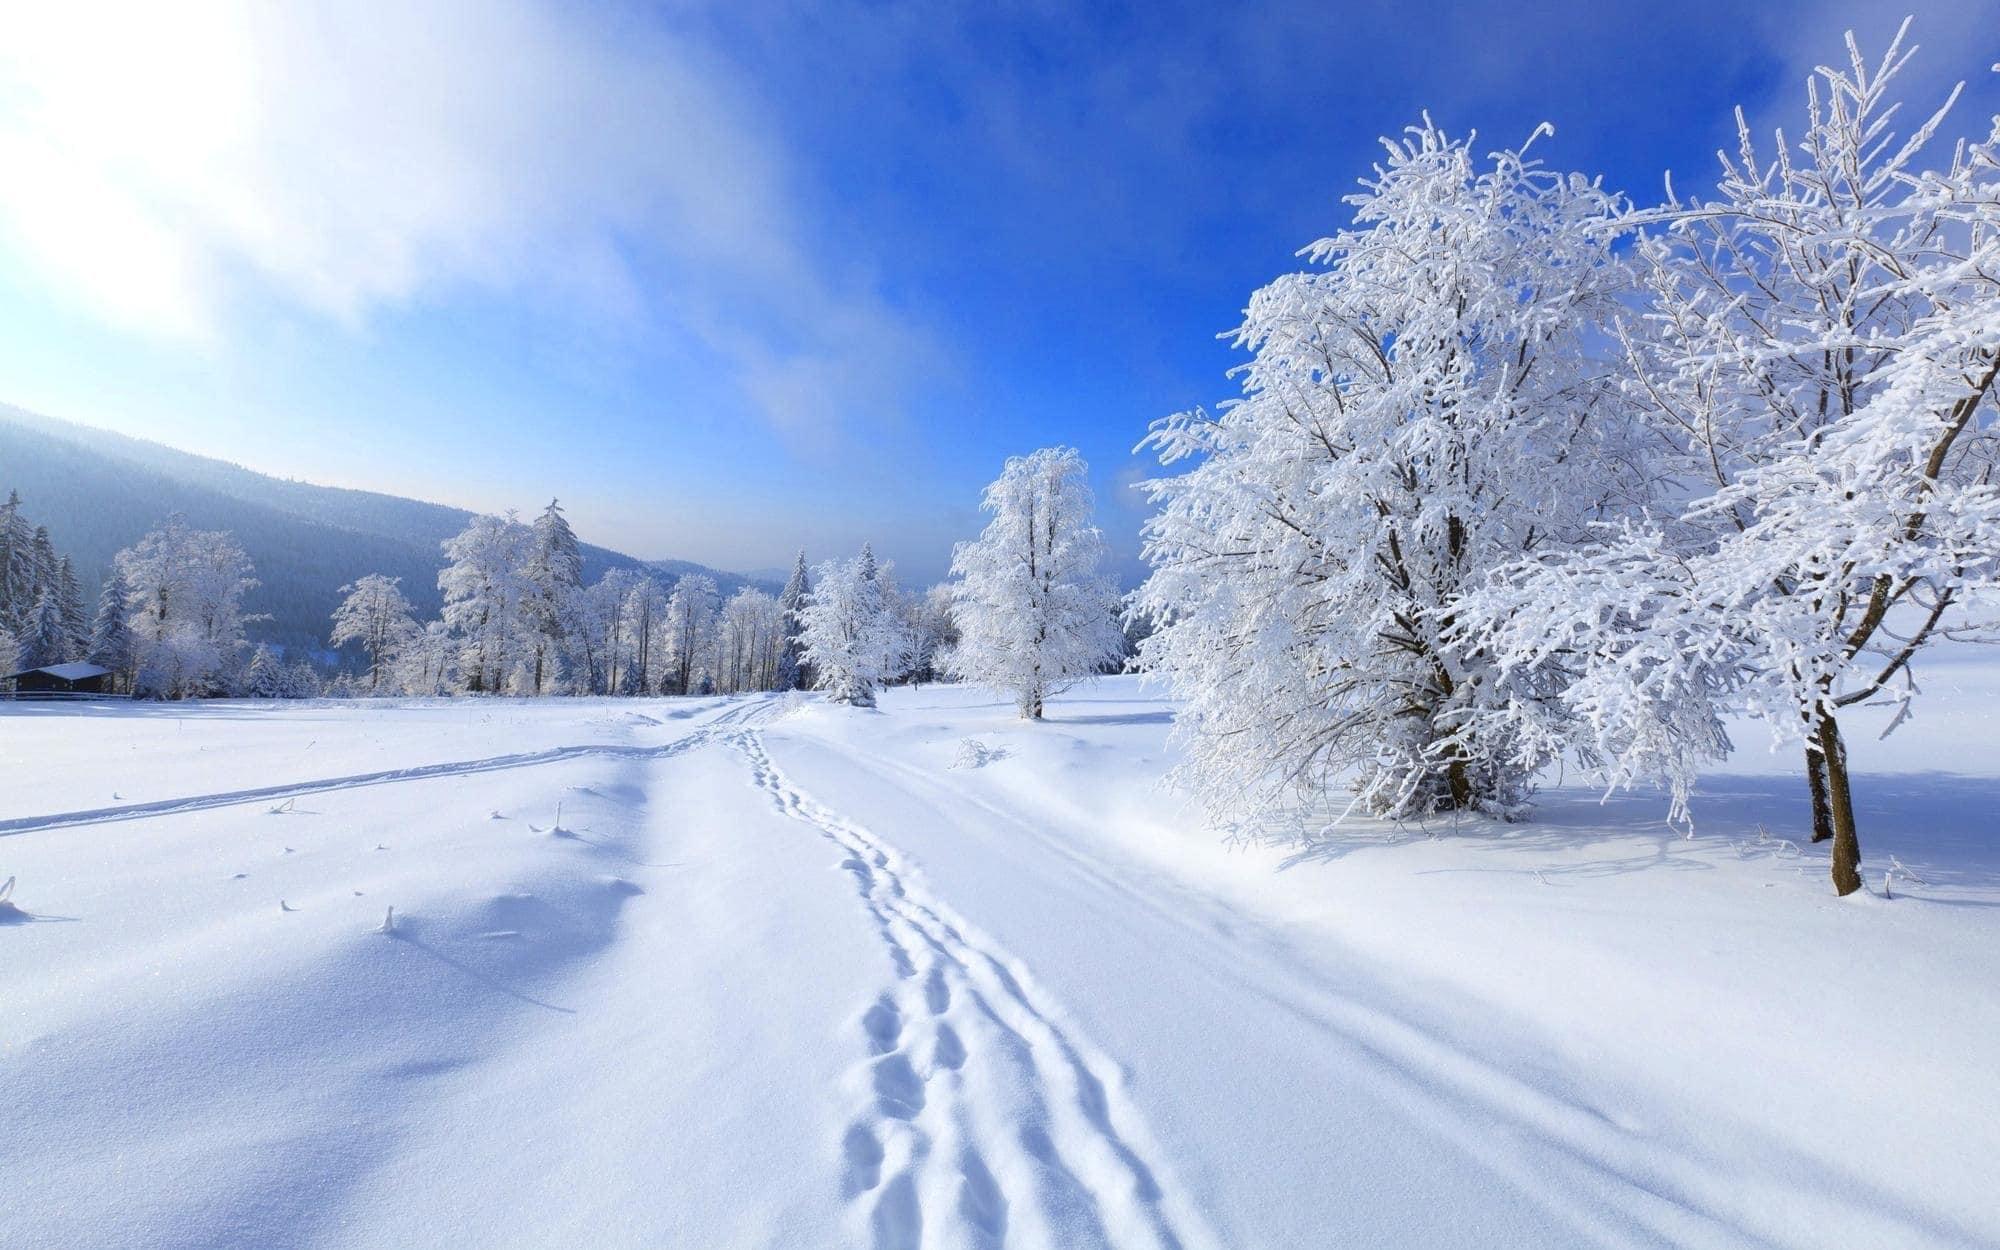 winter dream meaning, dream about winter, winter dream interpretation, seeing in a dream winter